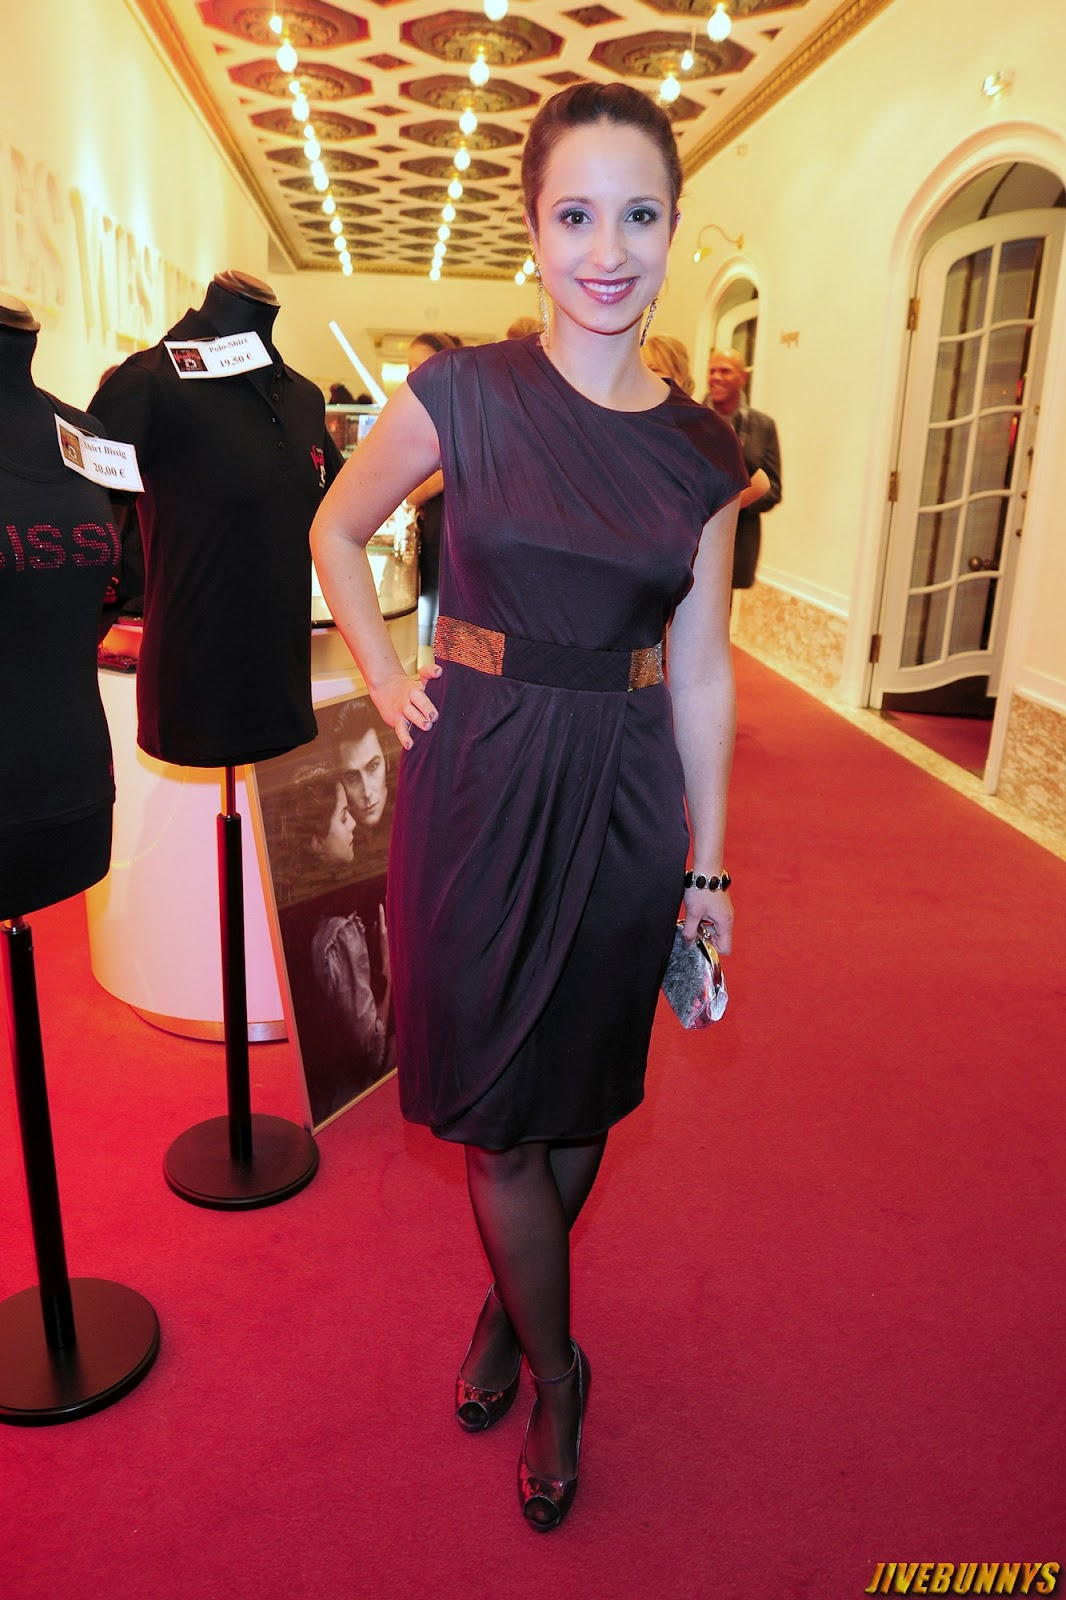 stephanie stumph actress photos gallery 1